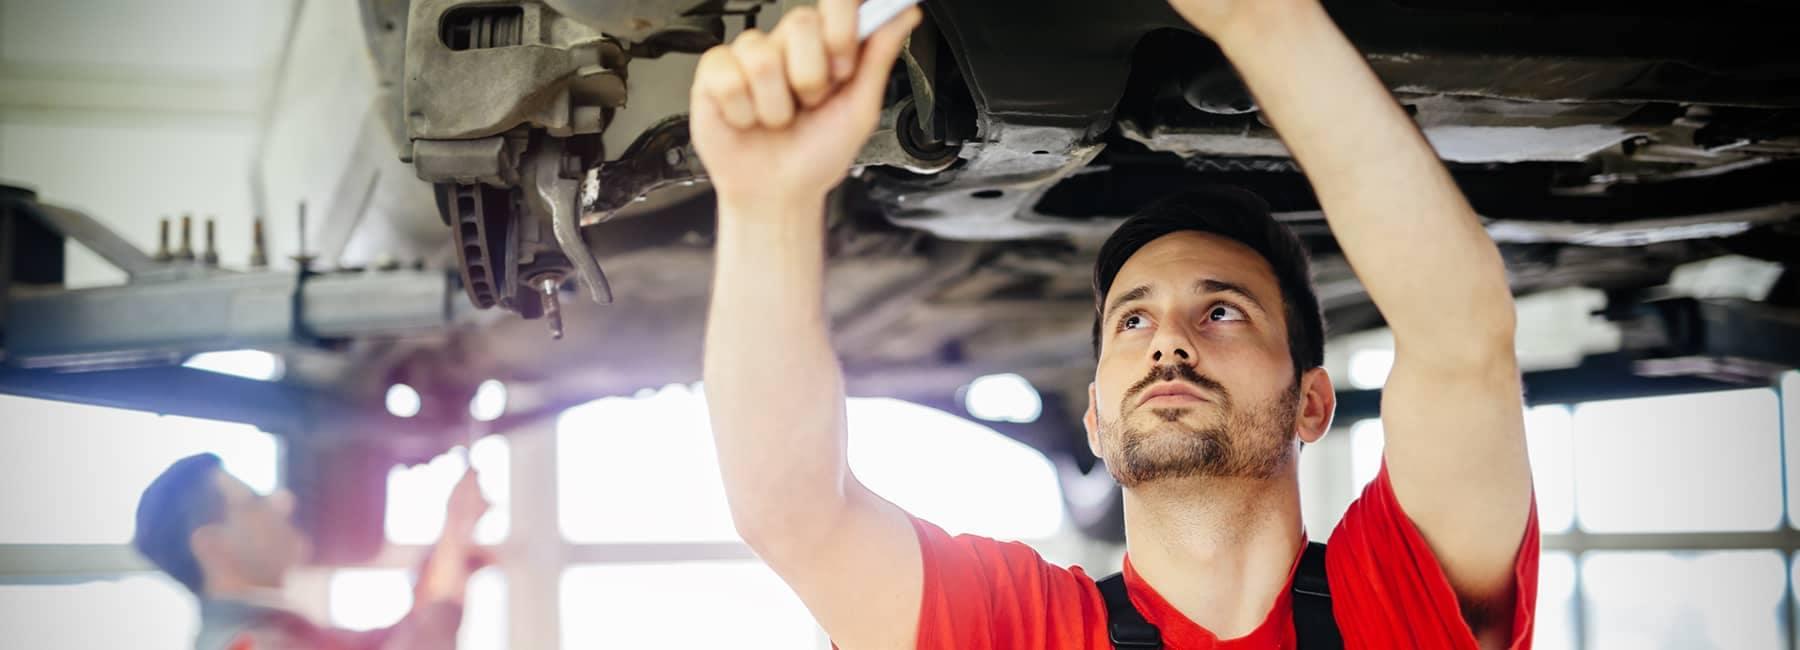 Service Technician Under Raised Vehicle